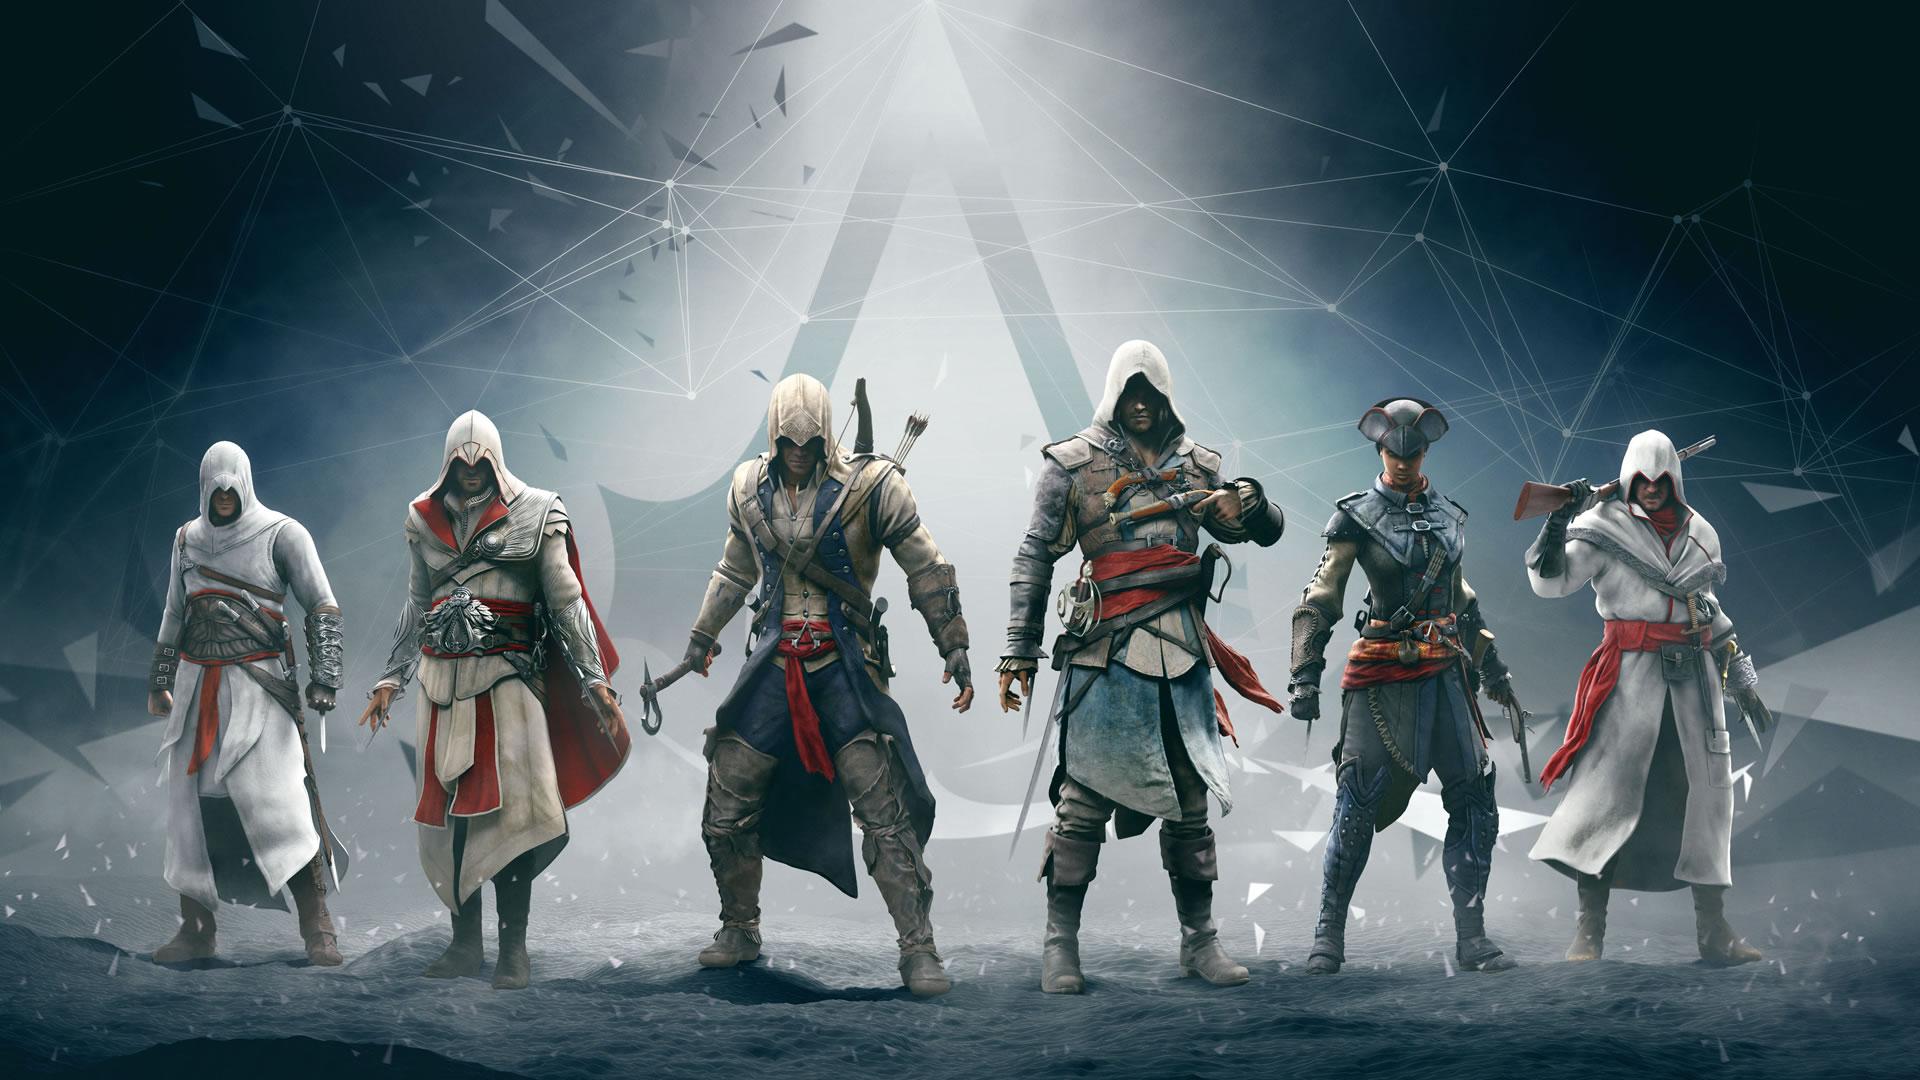 Free Download Assassins Creed Computer Wallpapers Desktop